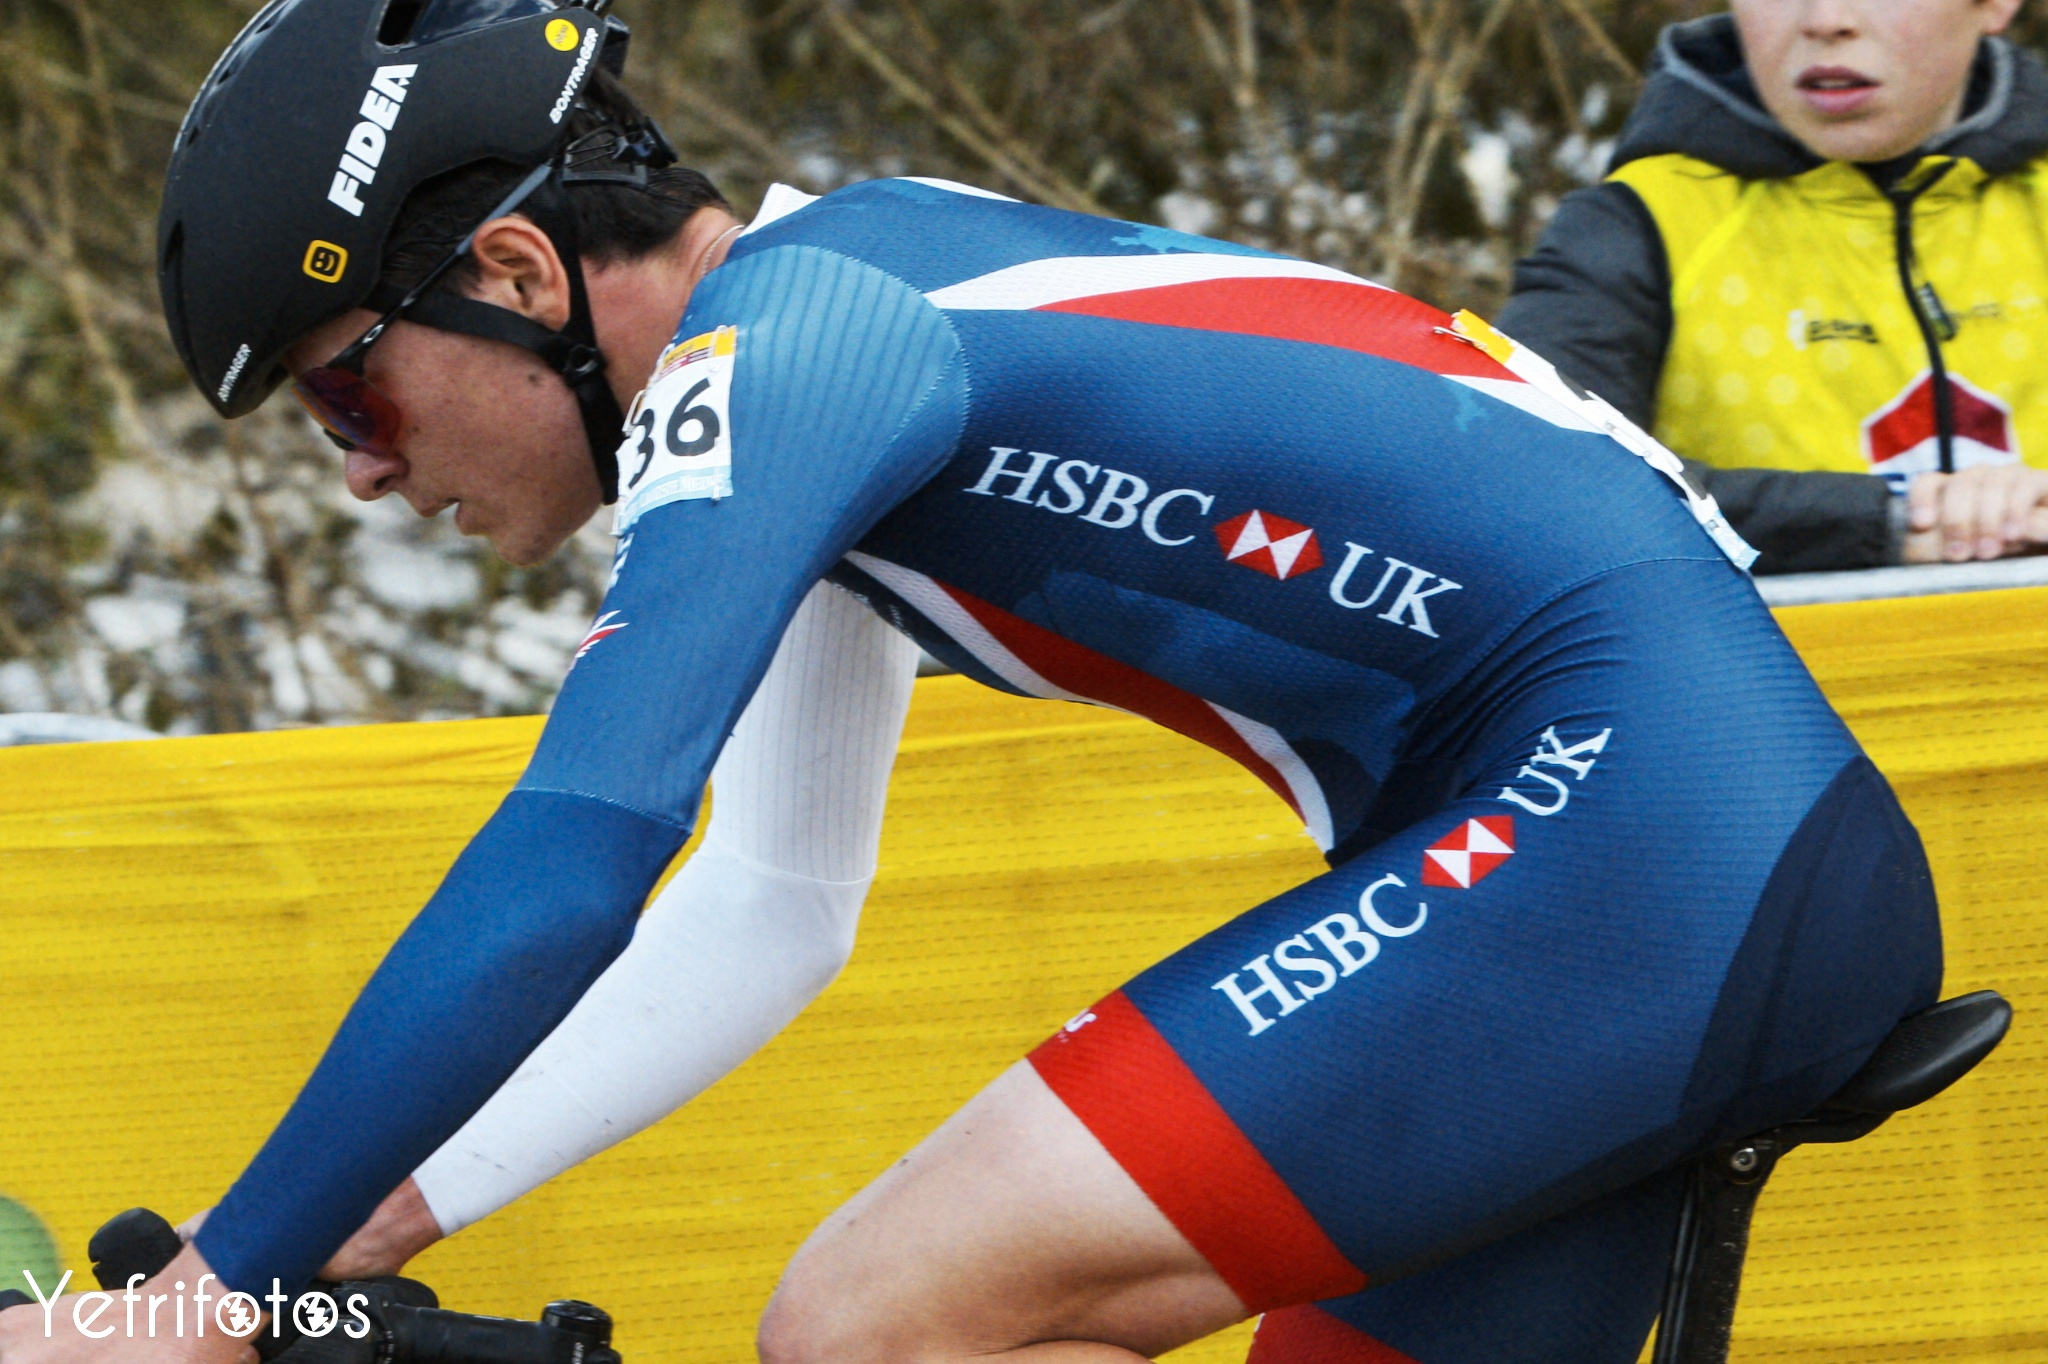 Koksijde - UCI Cyclocross World Cup - Thomas Pidcock